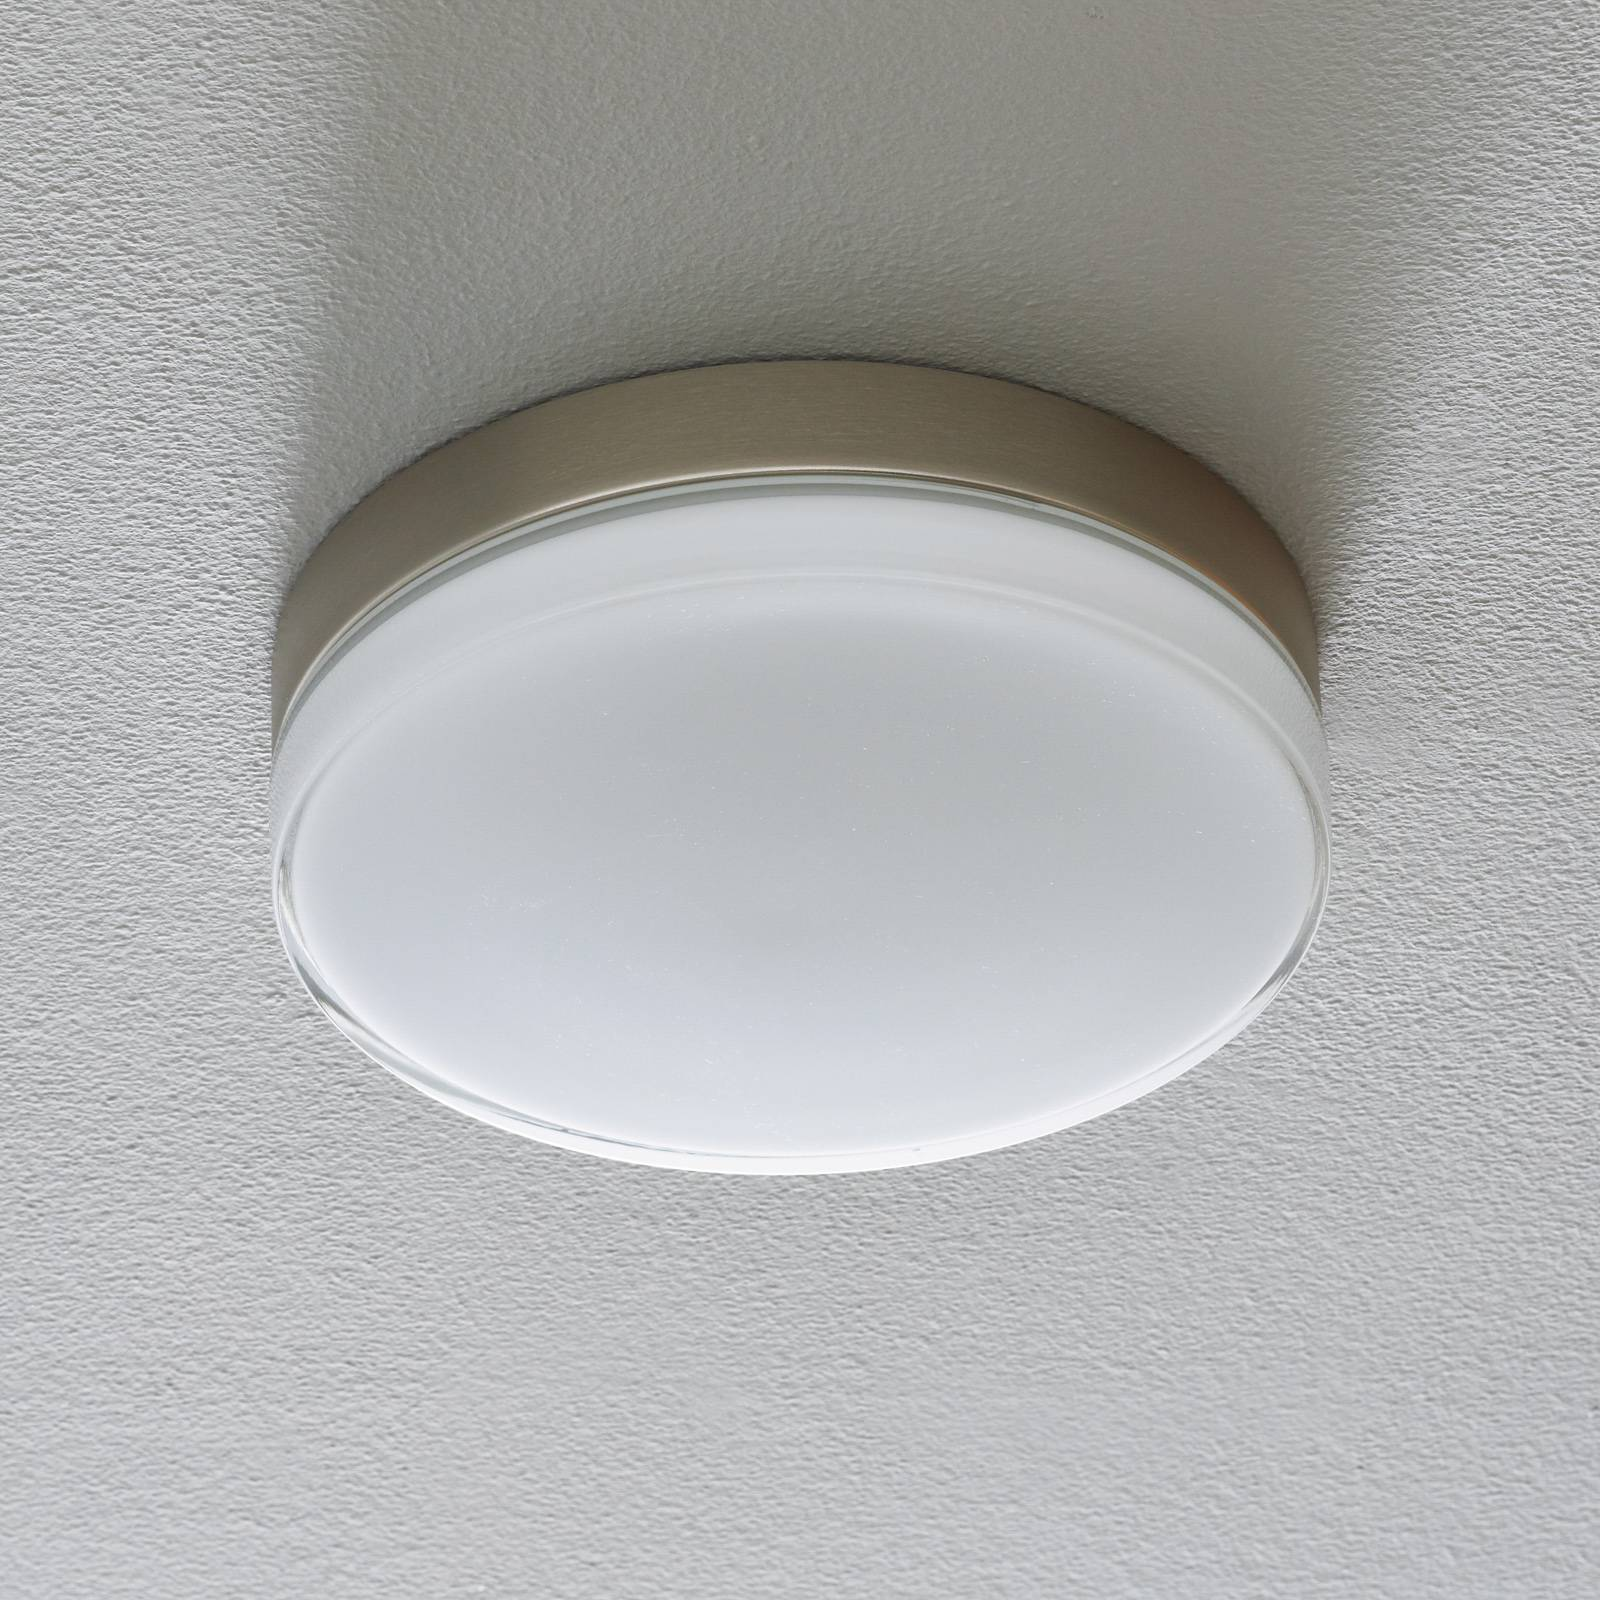 BEGA 12128 LED-kattovalaisin DALI 930 teräs 26cm